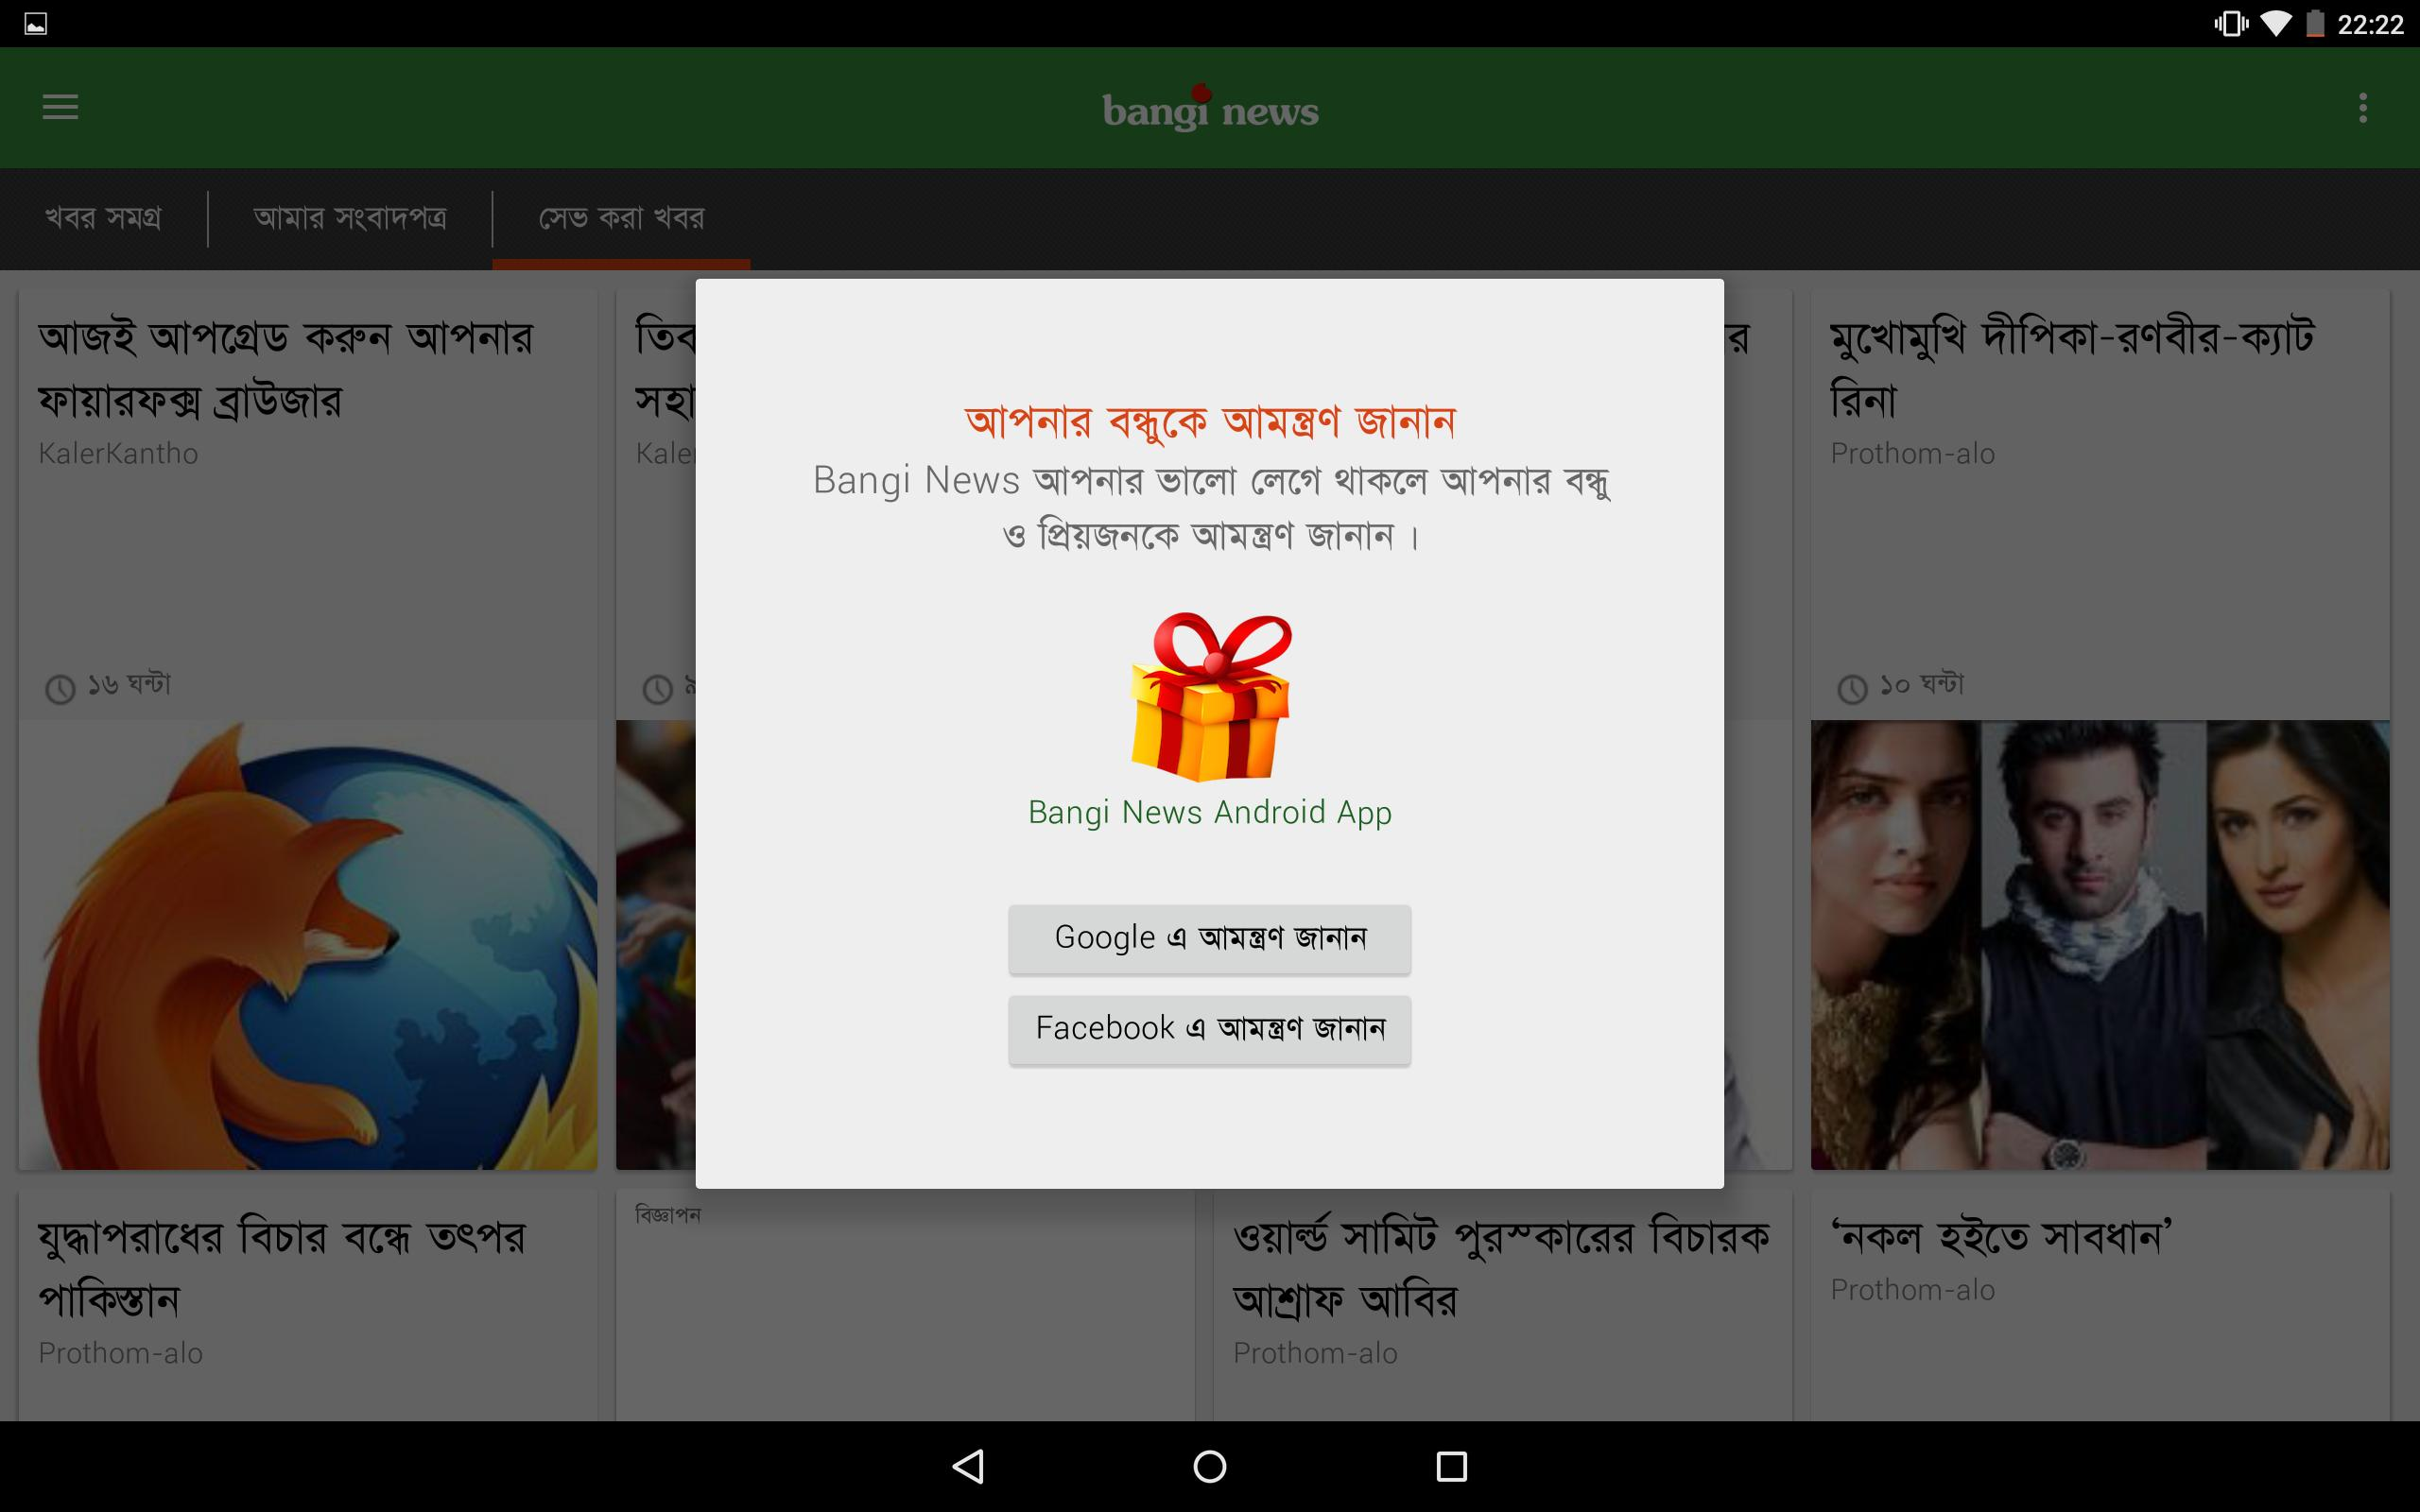 Bangla News & TV: Bangi News 11 تصوير الشاشة